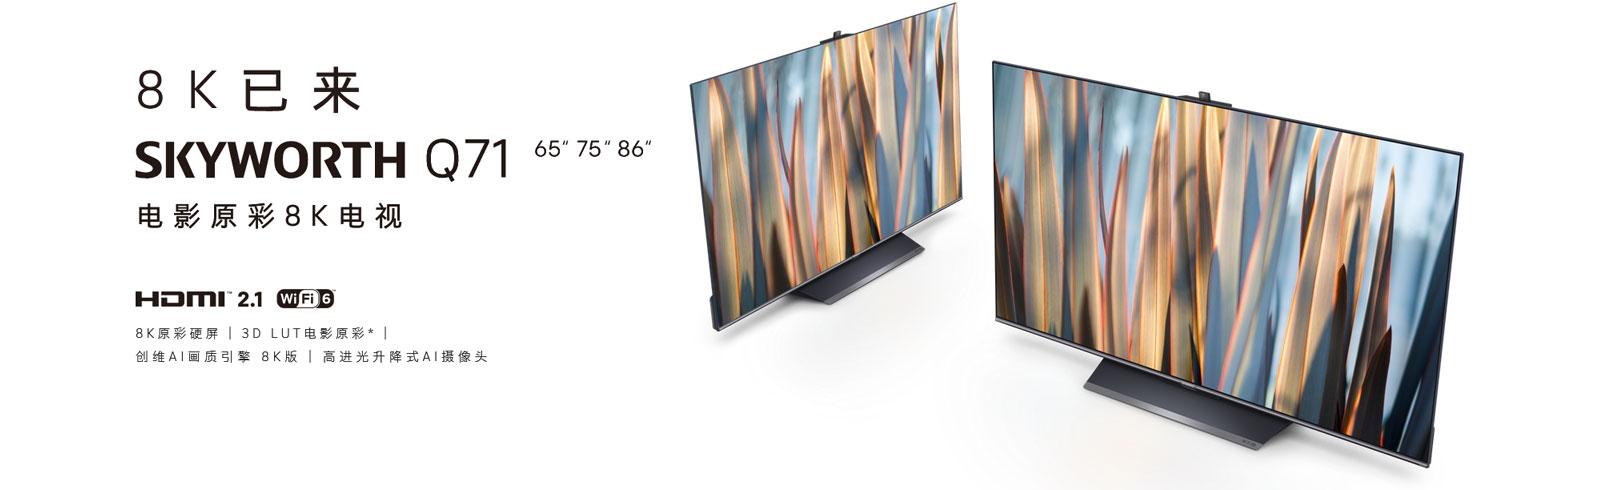 Skyworth Q71 series of 8K TVs is announced